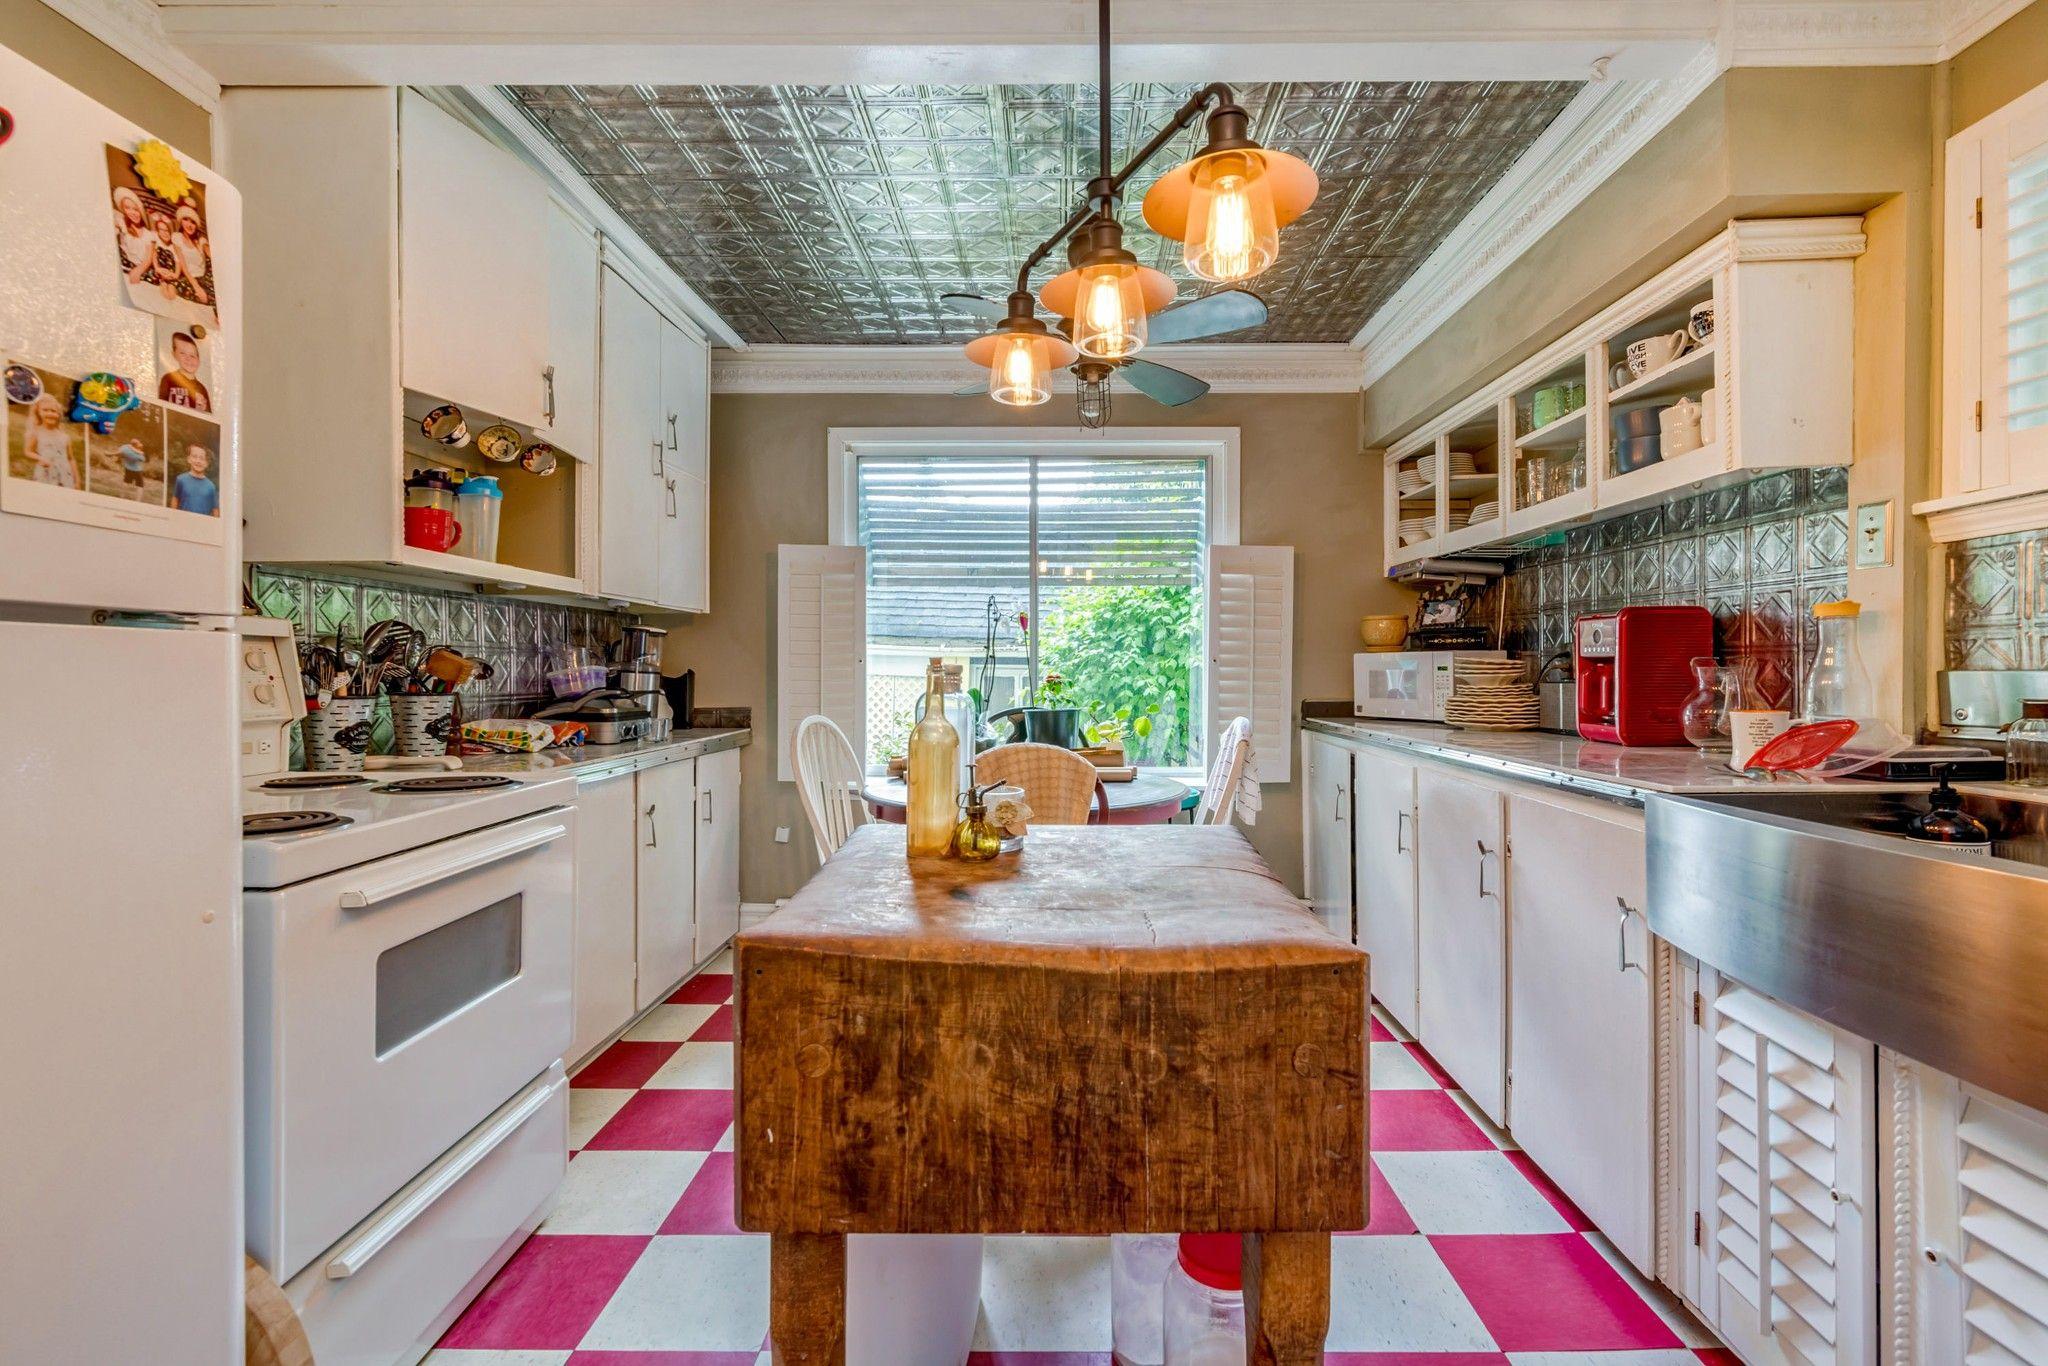 Photo 9: Photos: 20623 114 Avenue in Maple Ridge: Southwest Maple Ridge House for sale : MLS®# R2465656